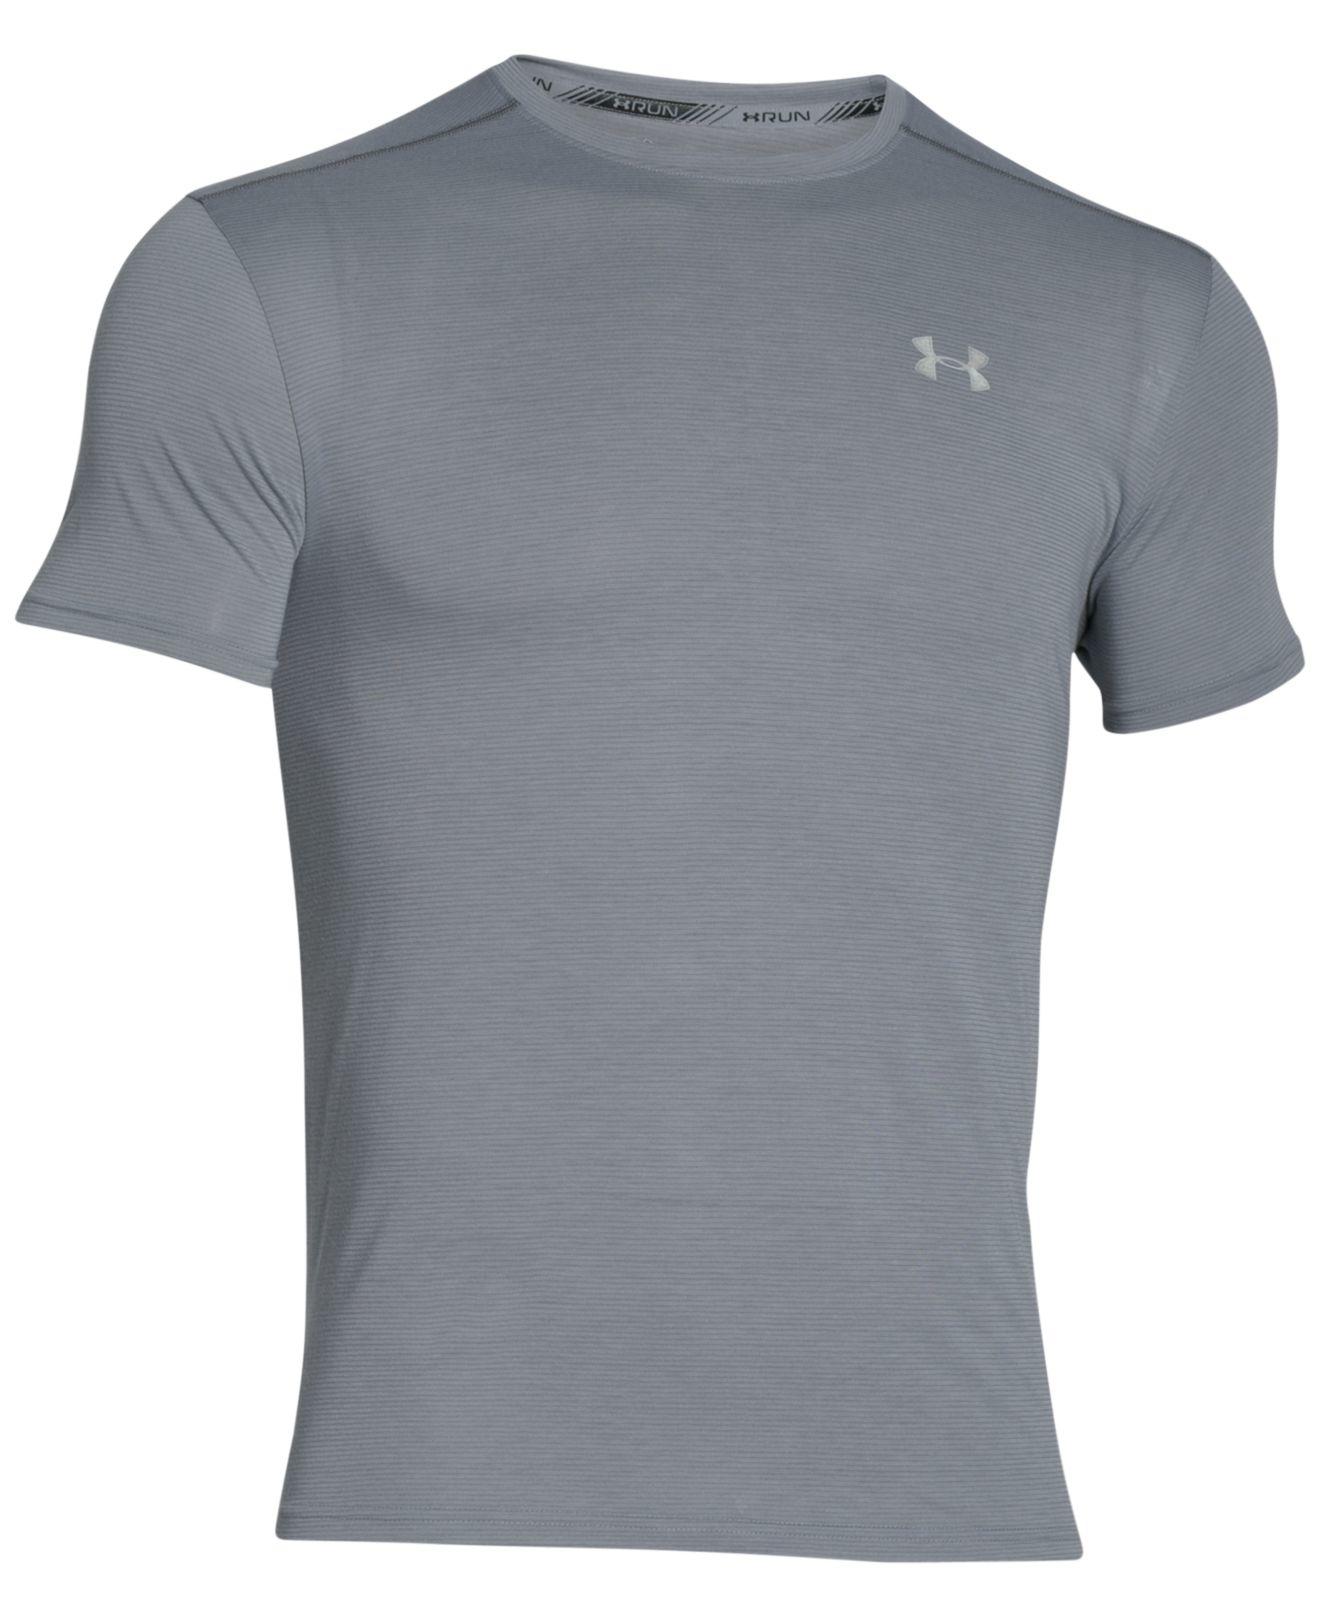 Under armour men 39 s streaker running t shirt in gray for for Gray under armour shirt